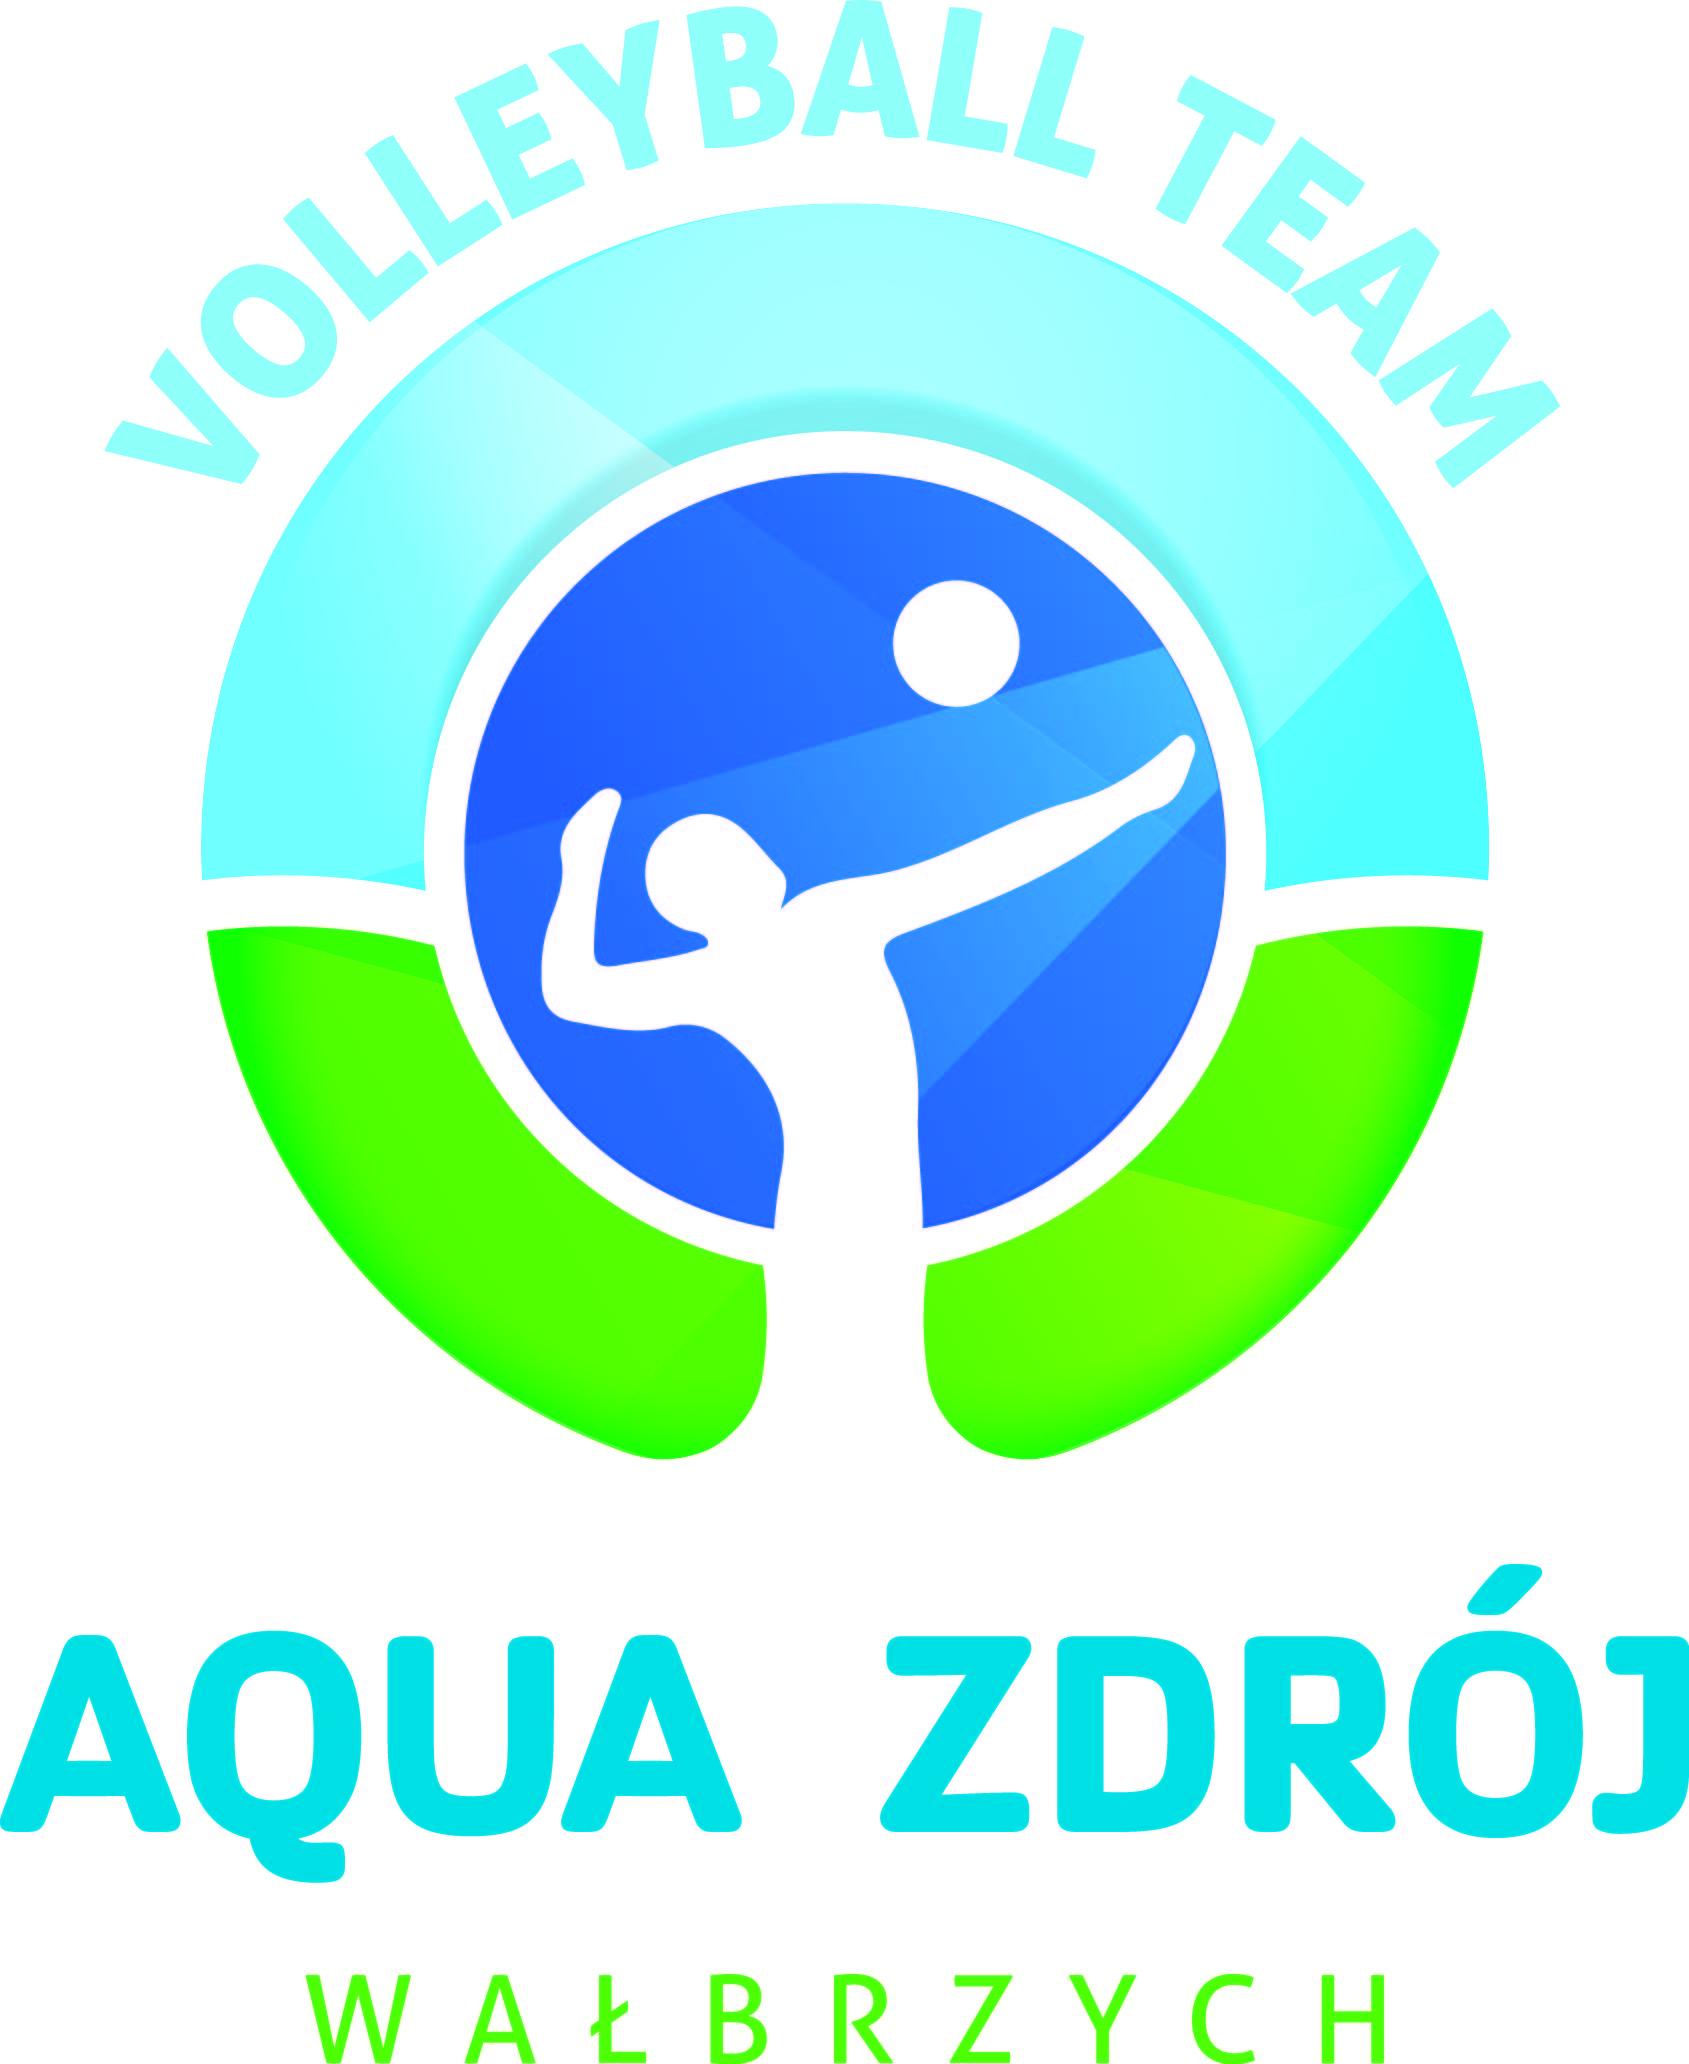 az_volley_color